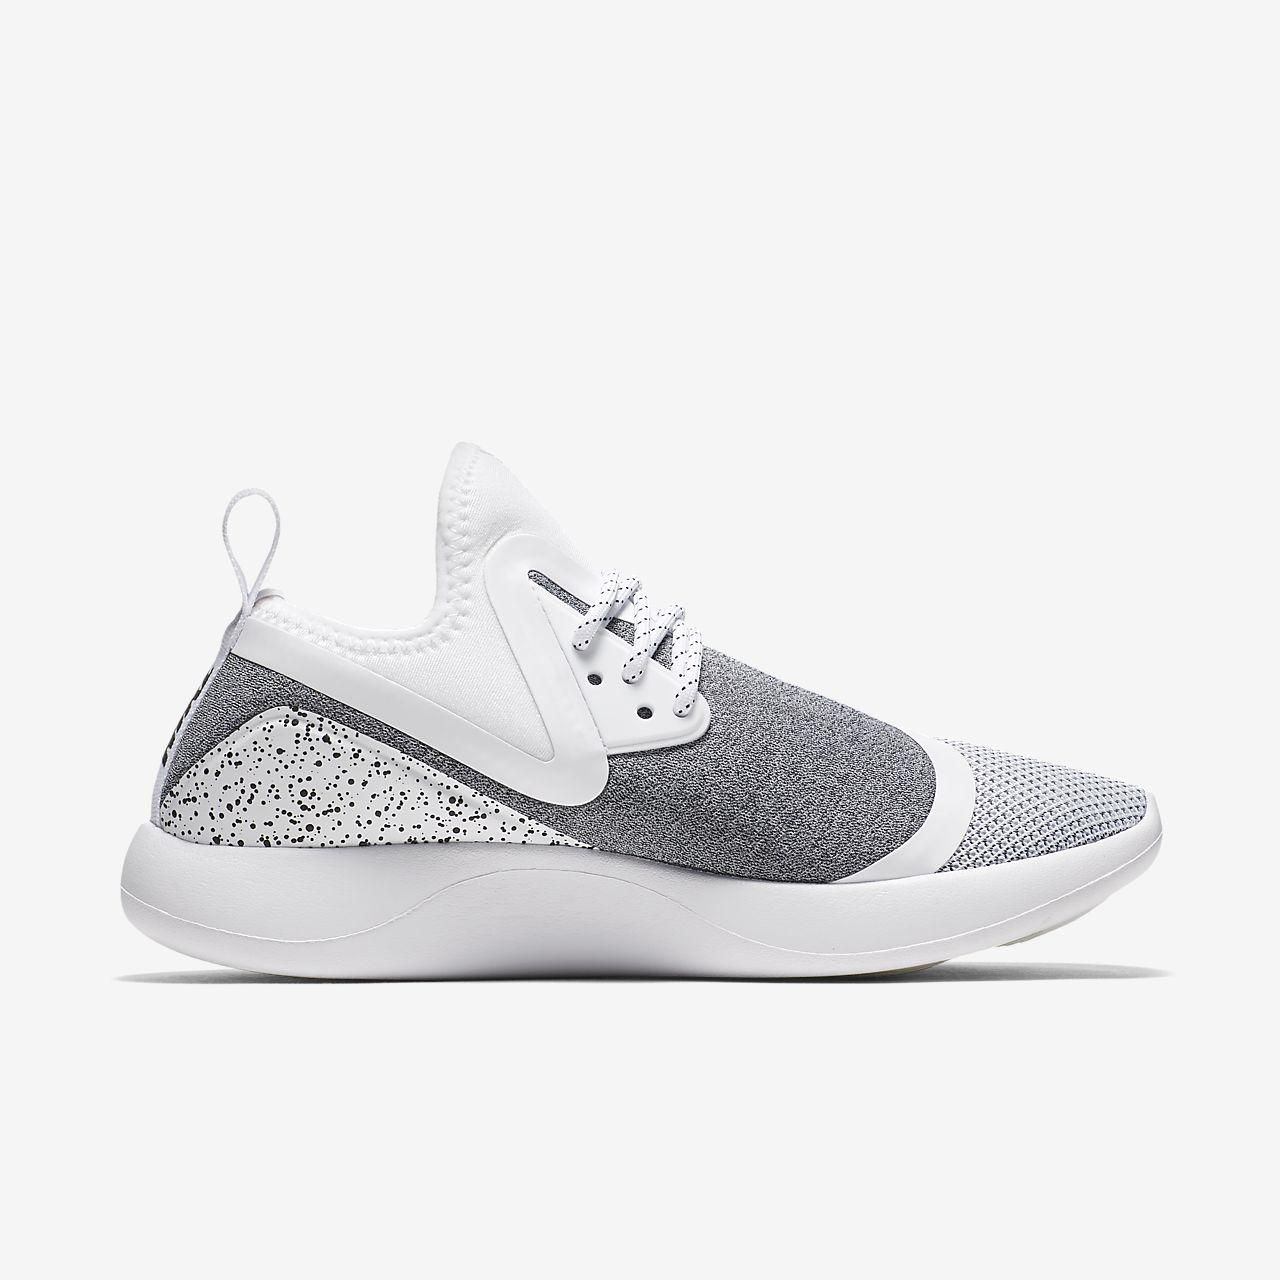 Nike Cargo Lunar Para Mujer Converse Blanco